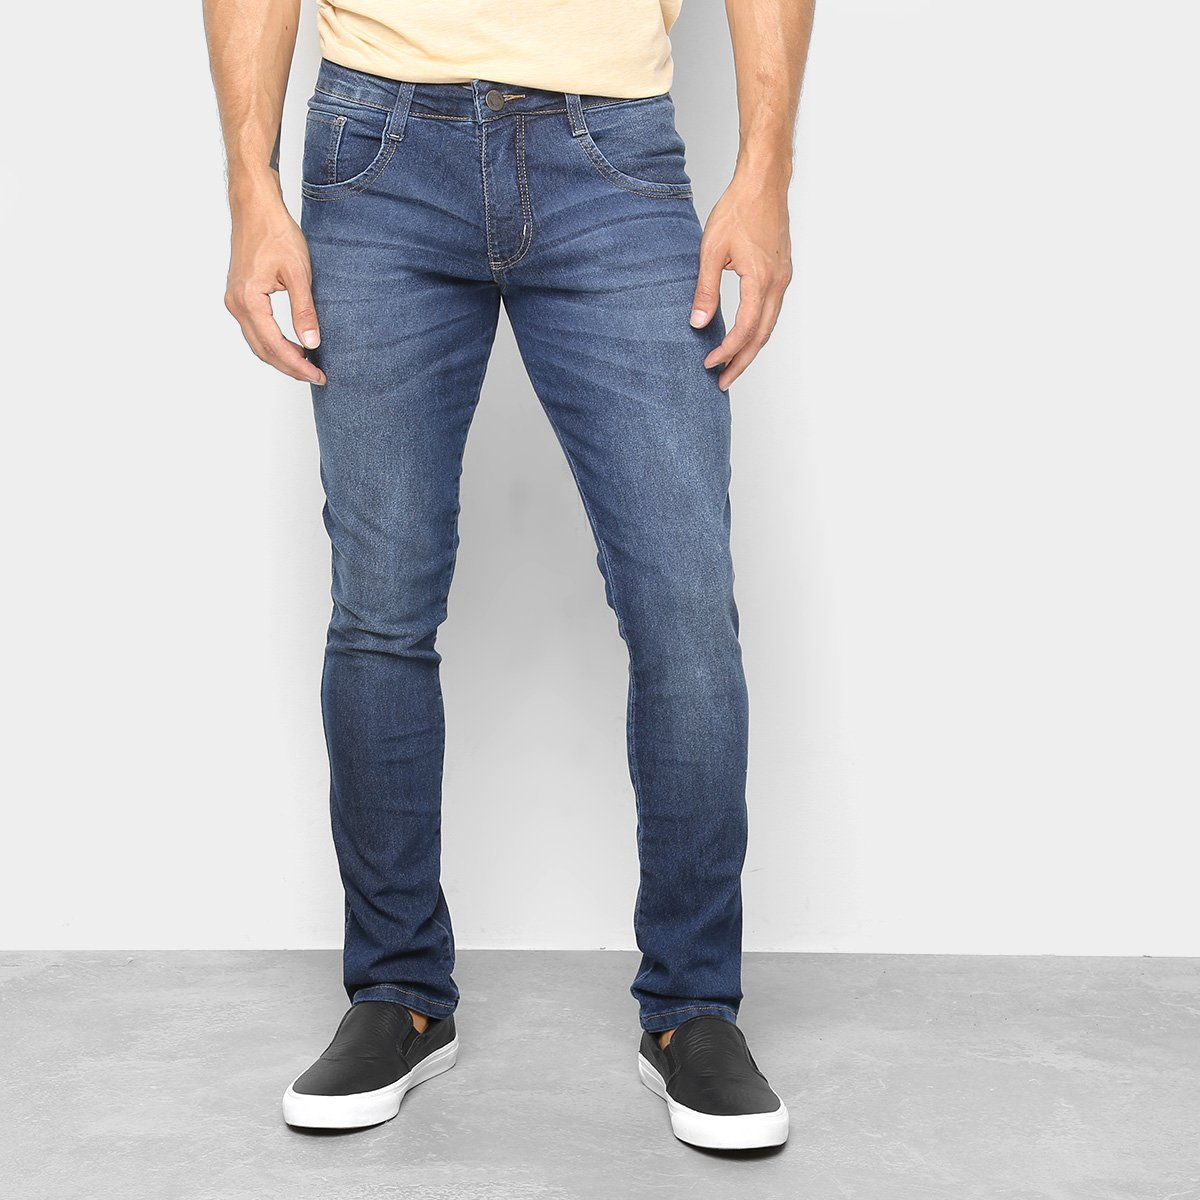 2a61b54dc Calça Jeans Skinny Biotipo Estonada Cintura Baixa Masculina - Tam ...